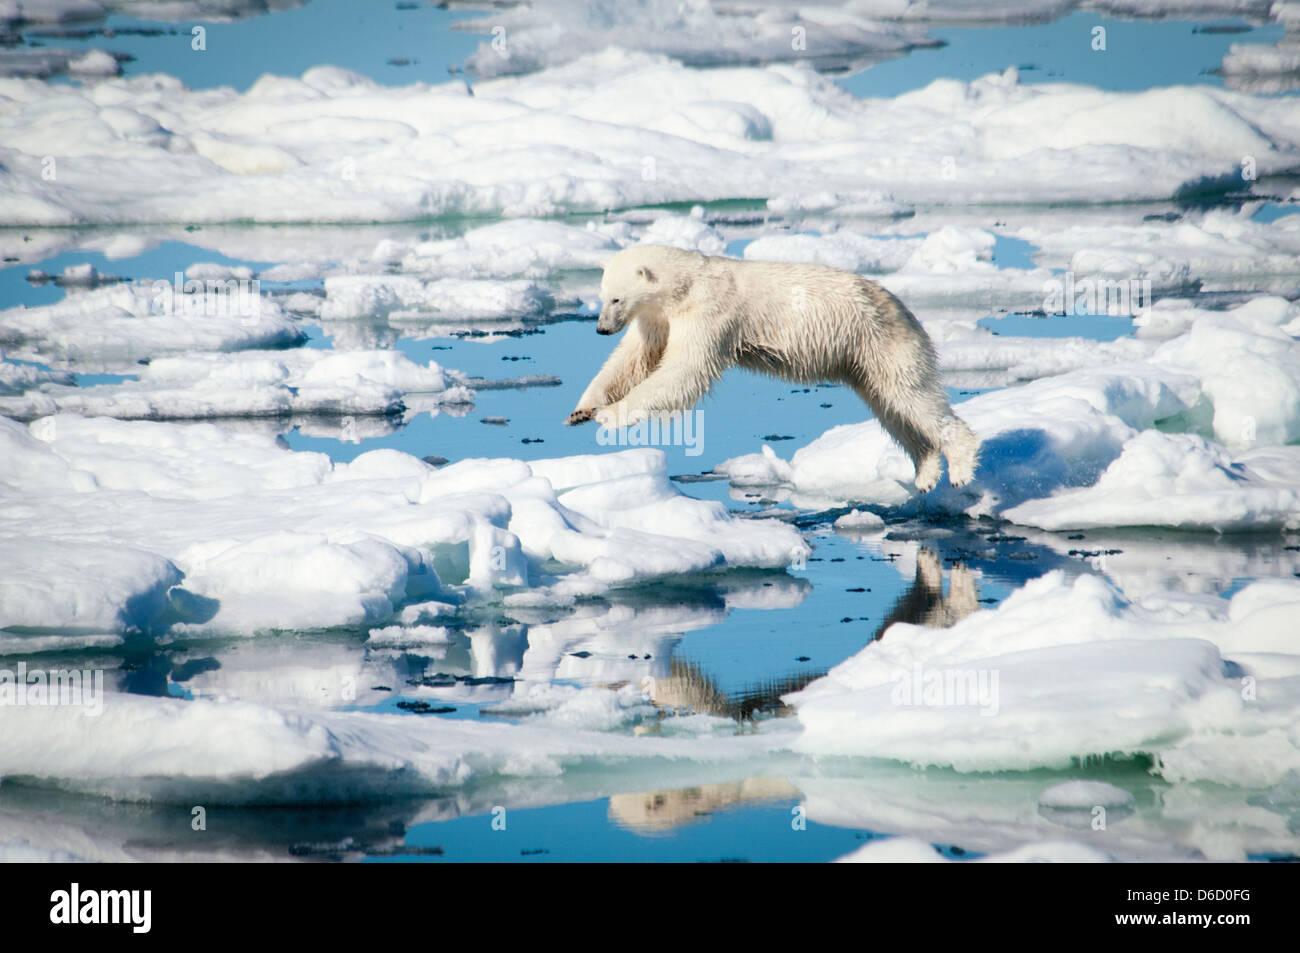 Polar Bear, Ursus maritimus, leaping over melting ice in the Olgastretet Pack Ice, Svalbard Archipelago, Norway Stock Photo